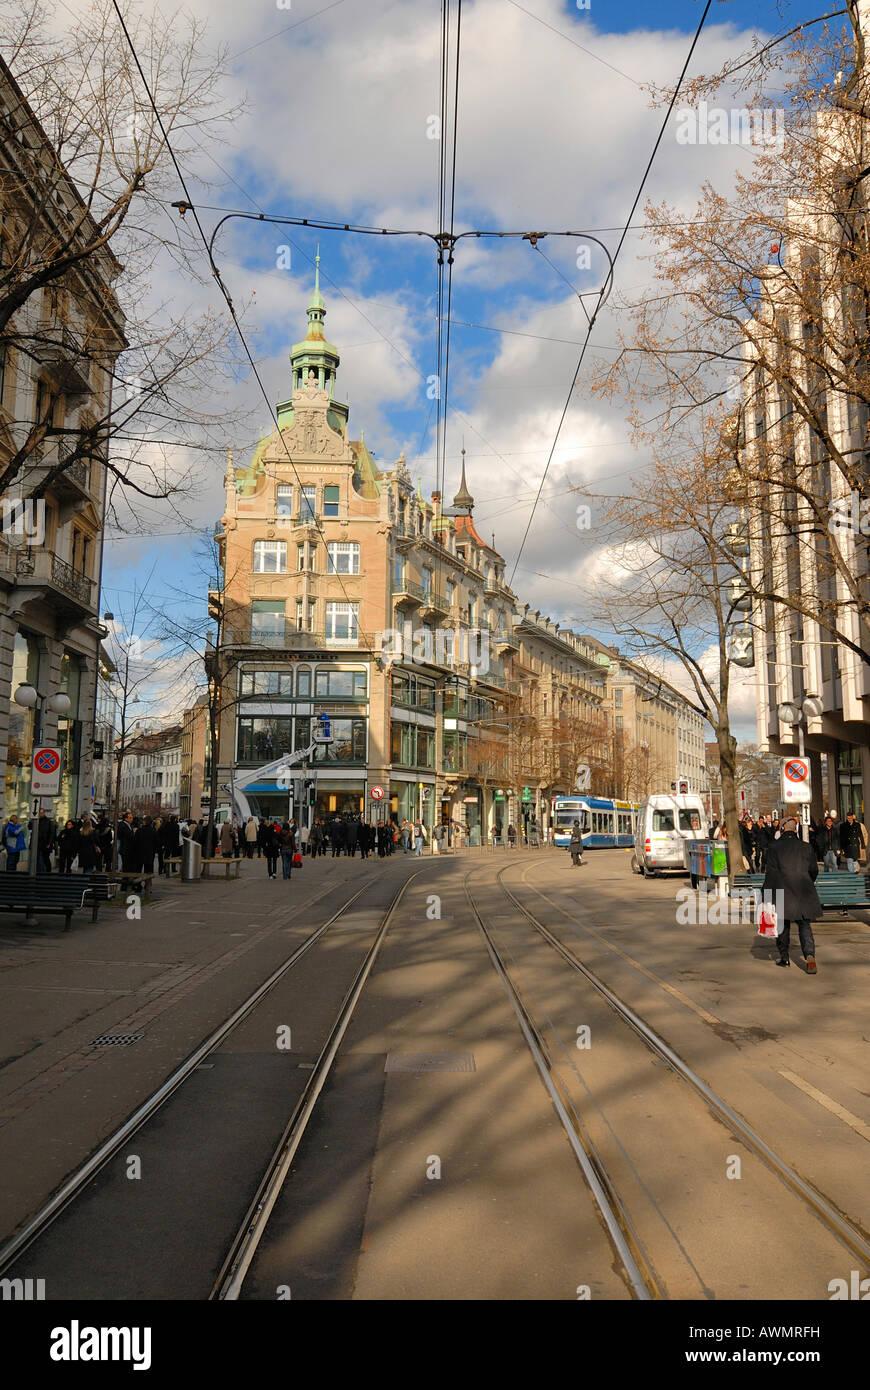 Zuerich - Bahnhofstrasse - Svizzera, Europa. Foto Stock